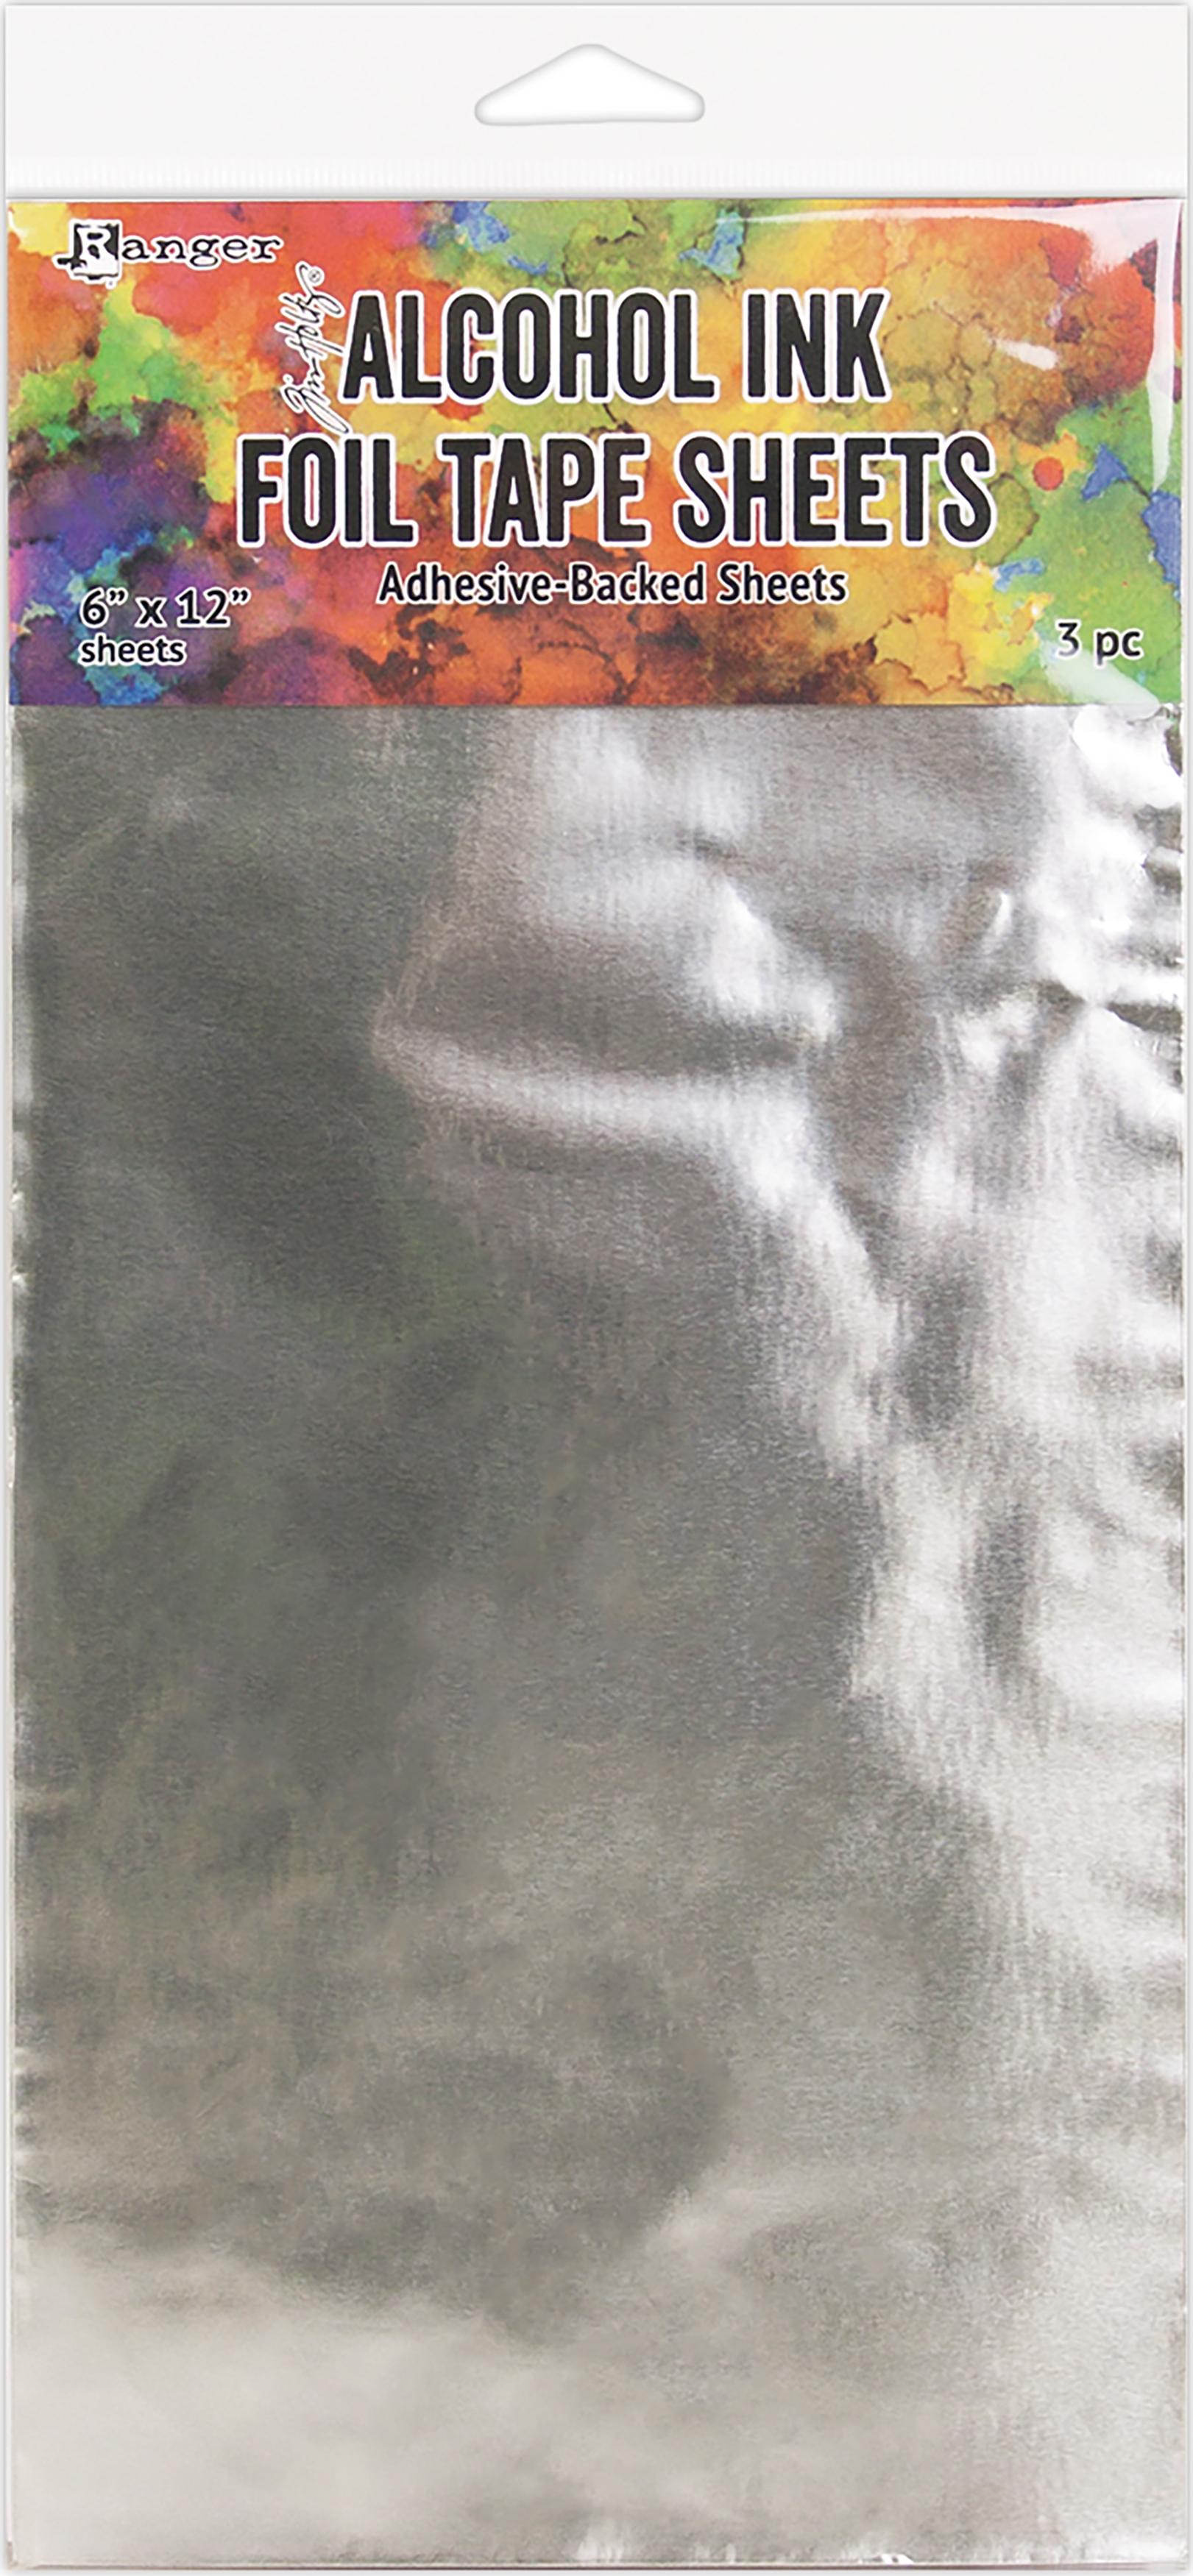 Alcohol Ink Foil Sheet 6x12